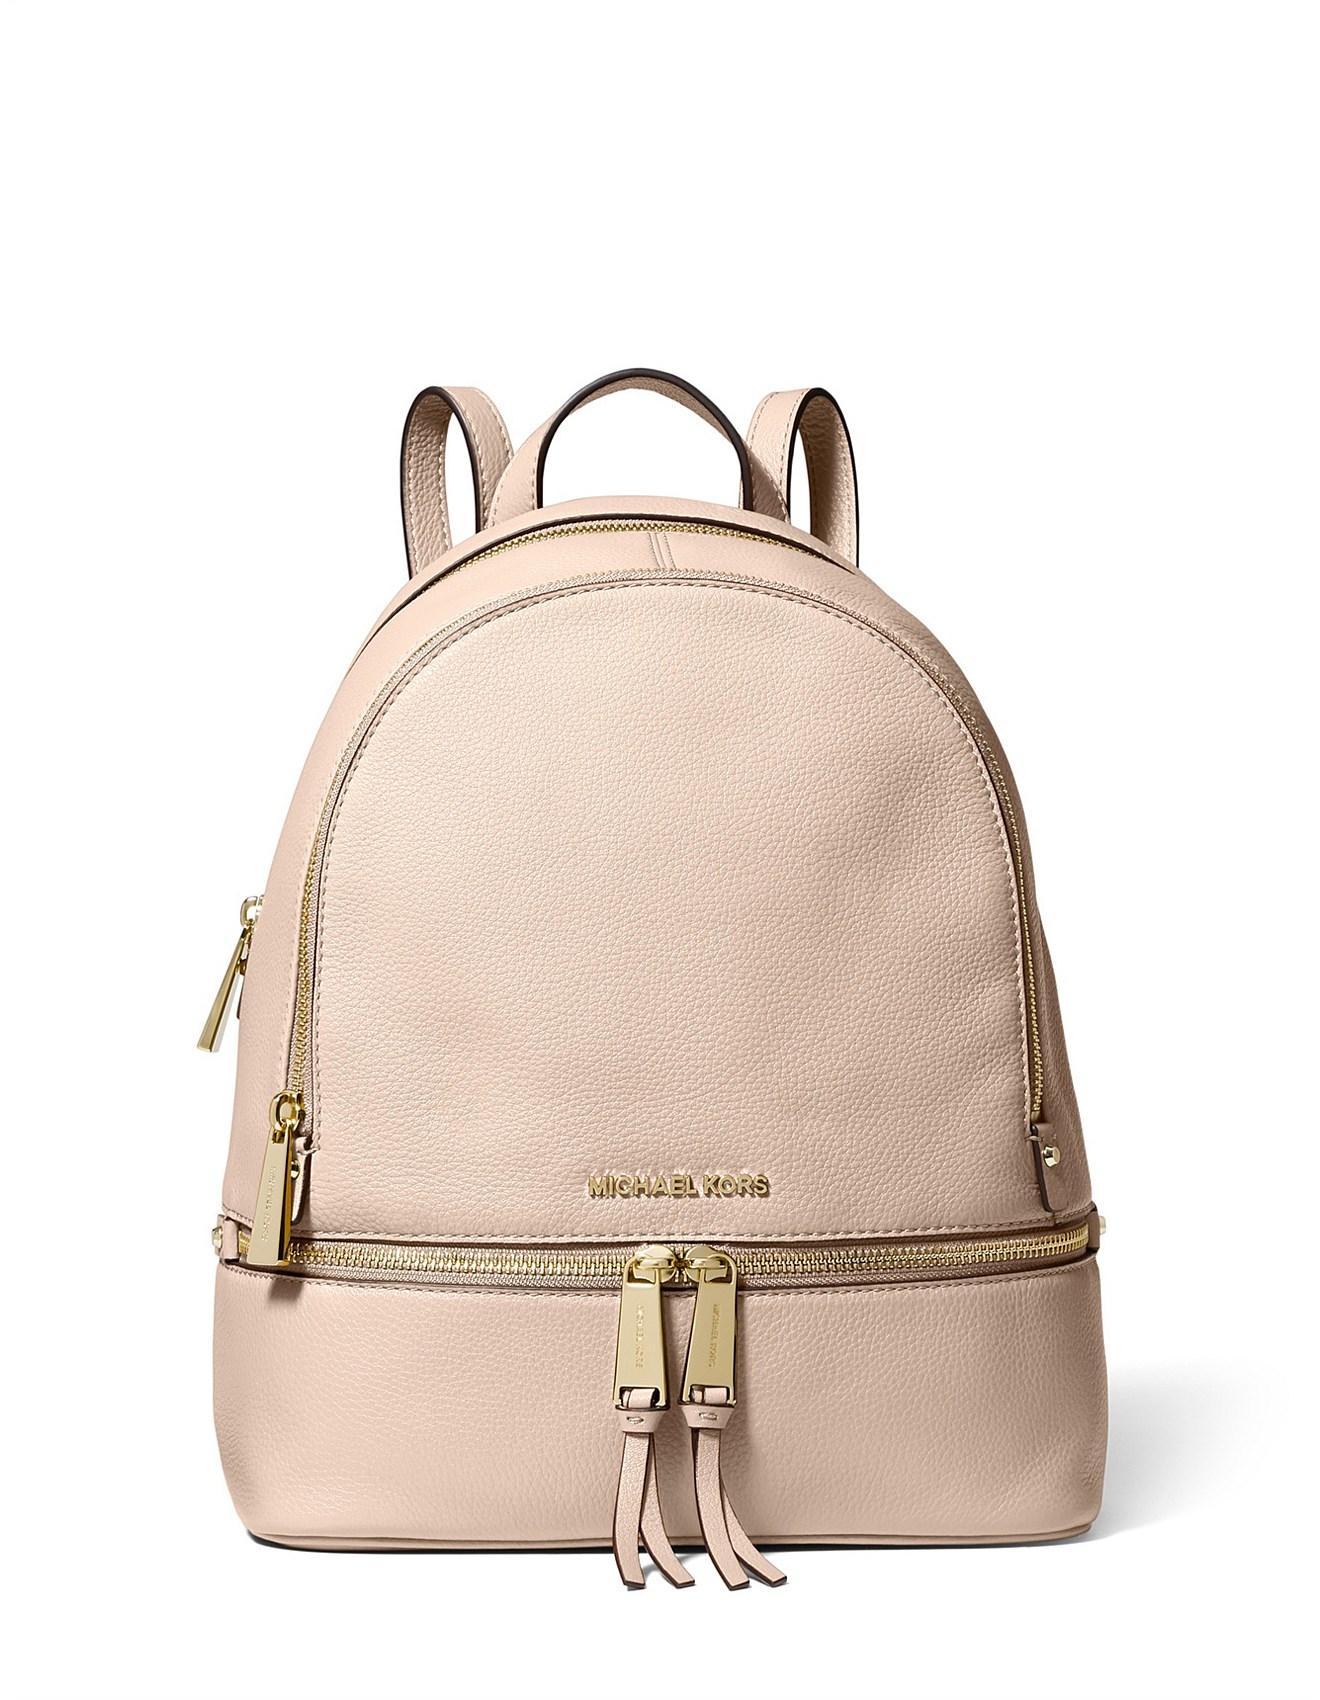 4e841ab714e8 Michael Kors - Pink Rhea Medium Backpack - Lyst. View fullscreen